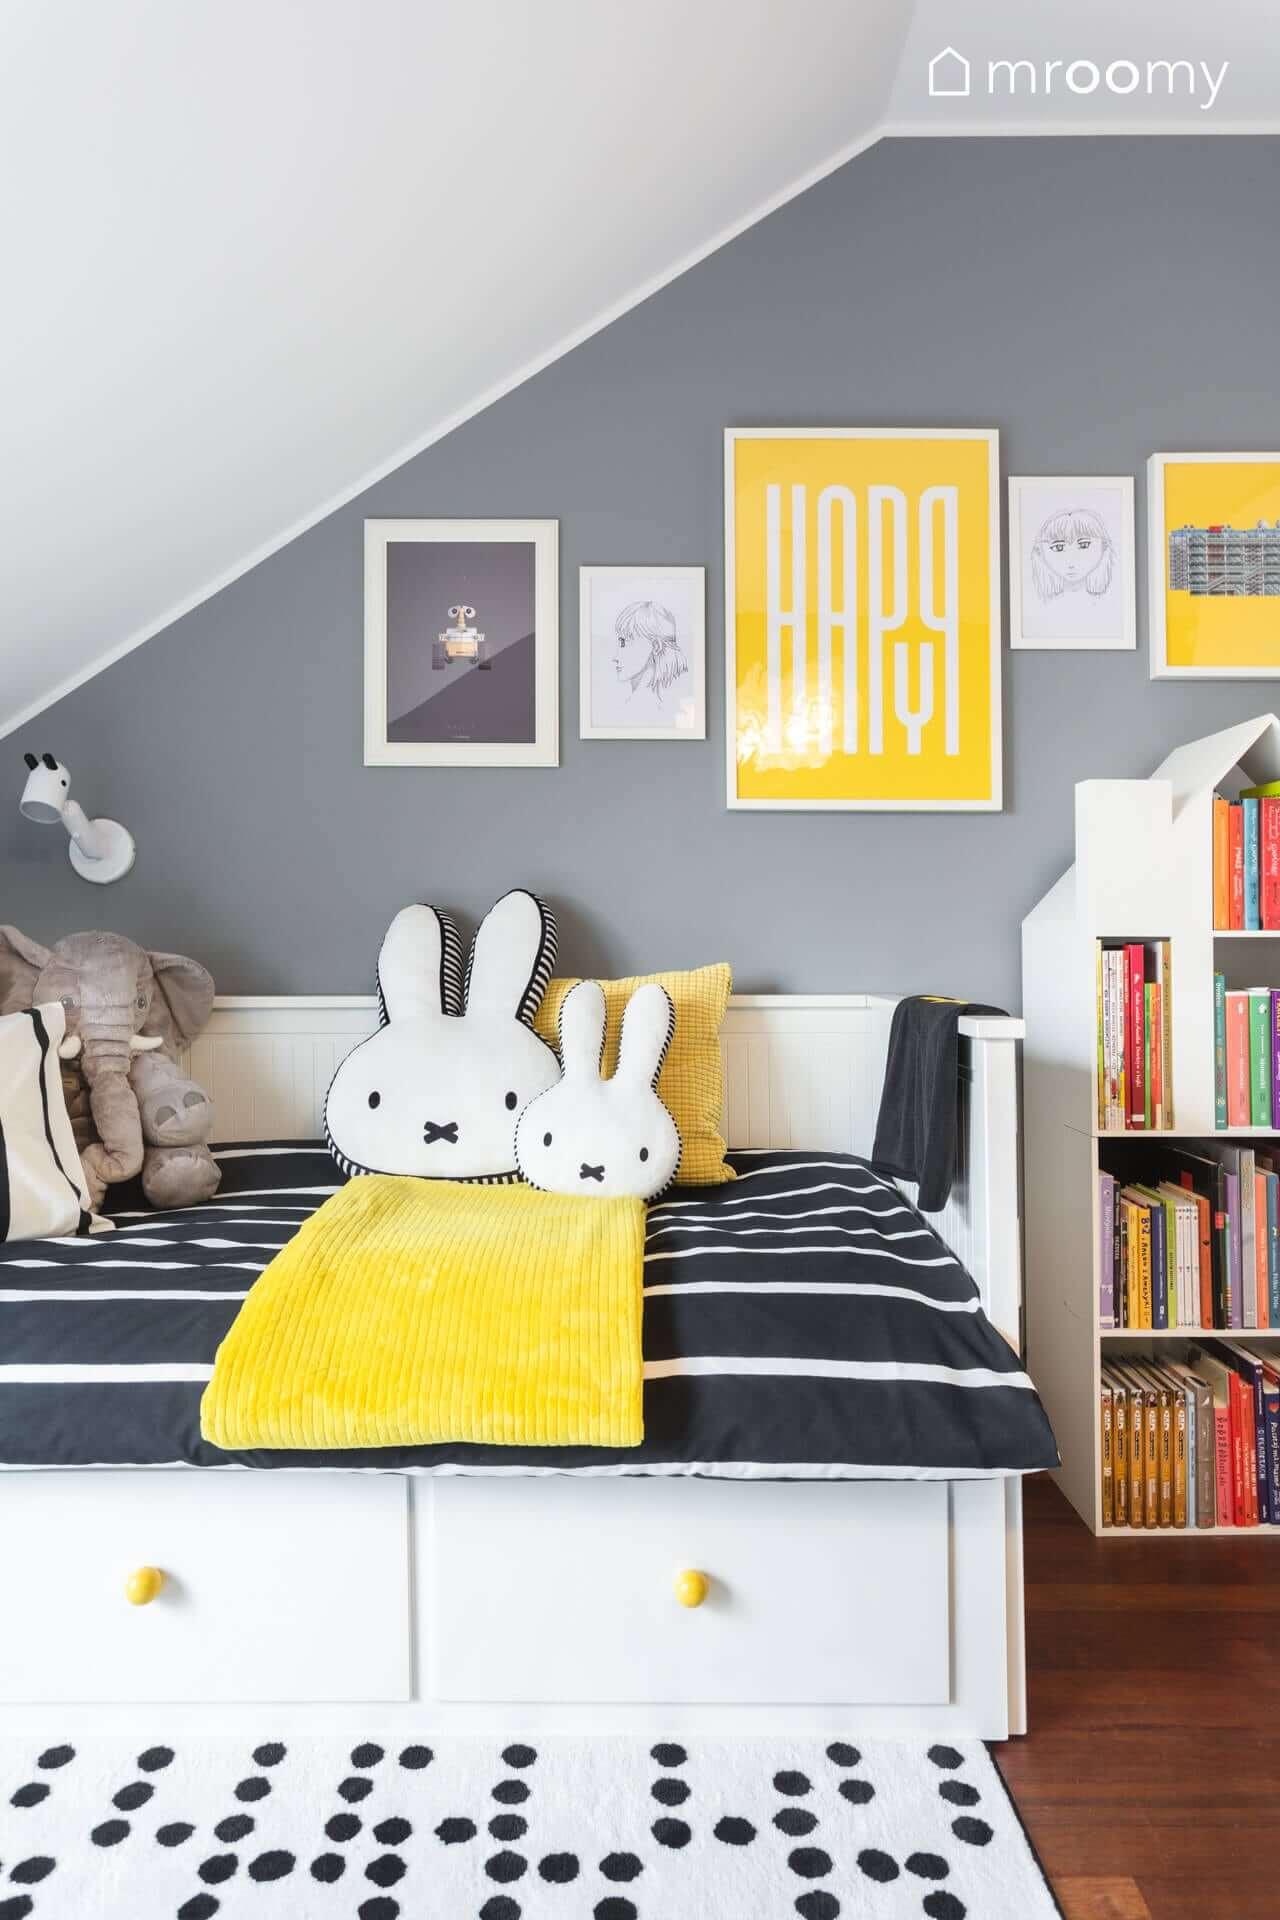 hemnes łóżko gałki little form studio